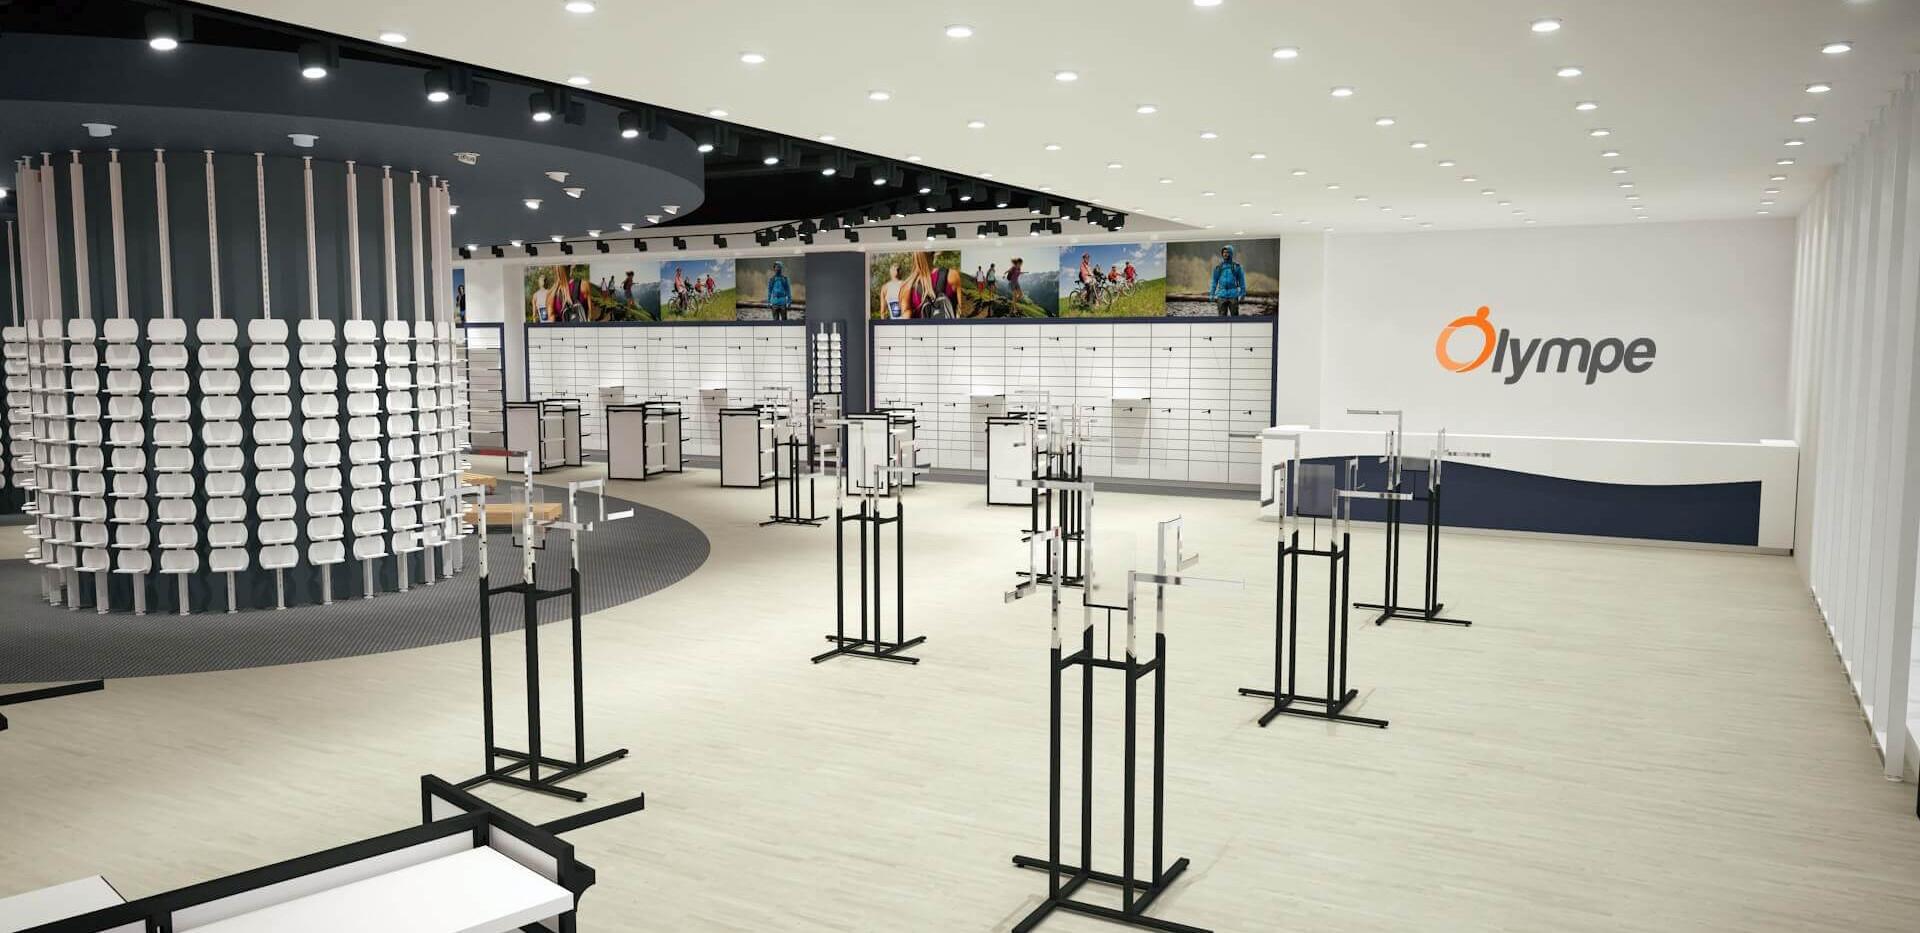 Olympe - Sports Store Shop Design-4.jpg